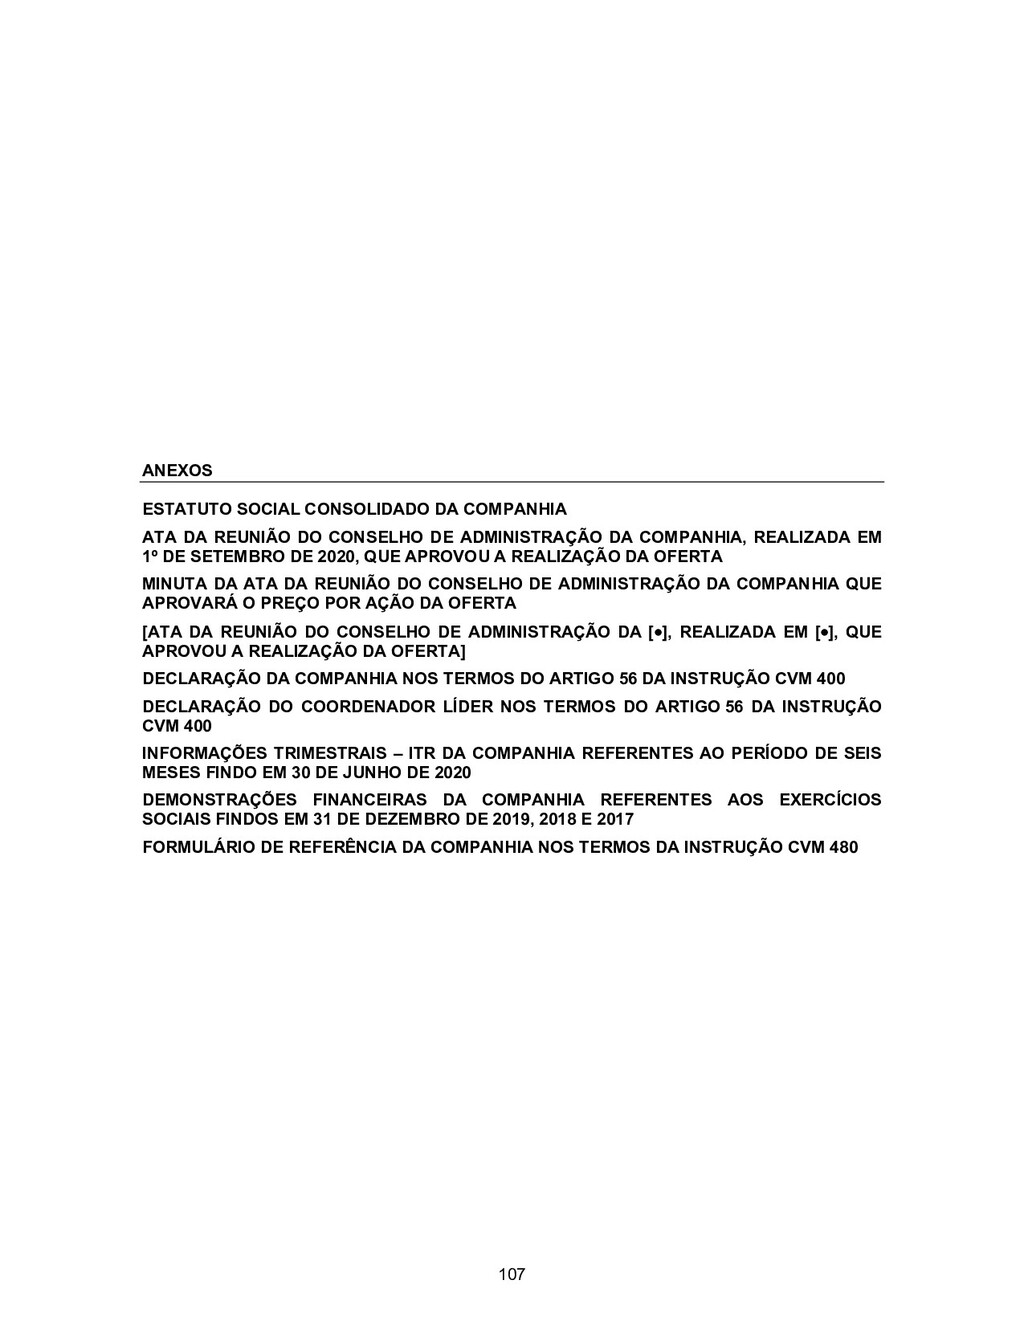 ANEXOS ESTATUTO SOCIAL CONSOLIDADO DA COMPANHIA...